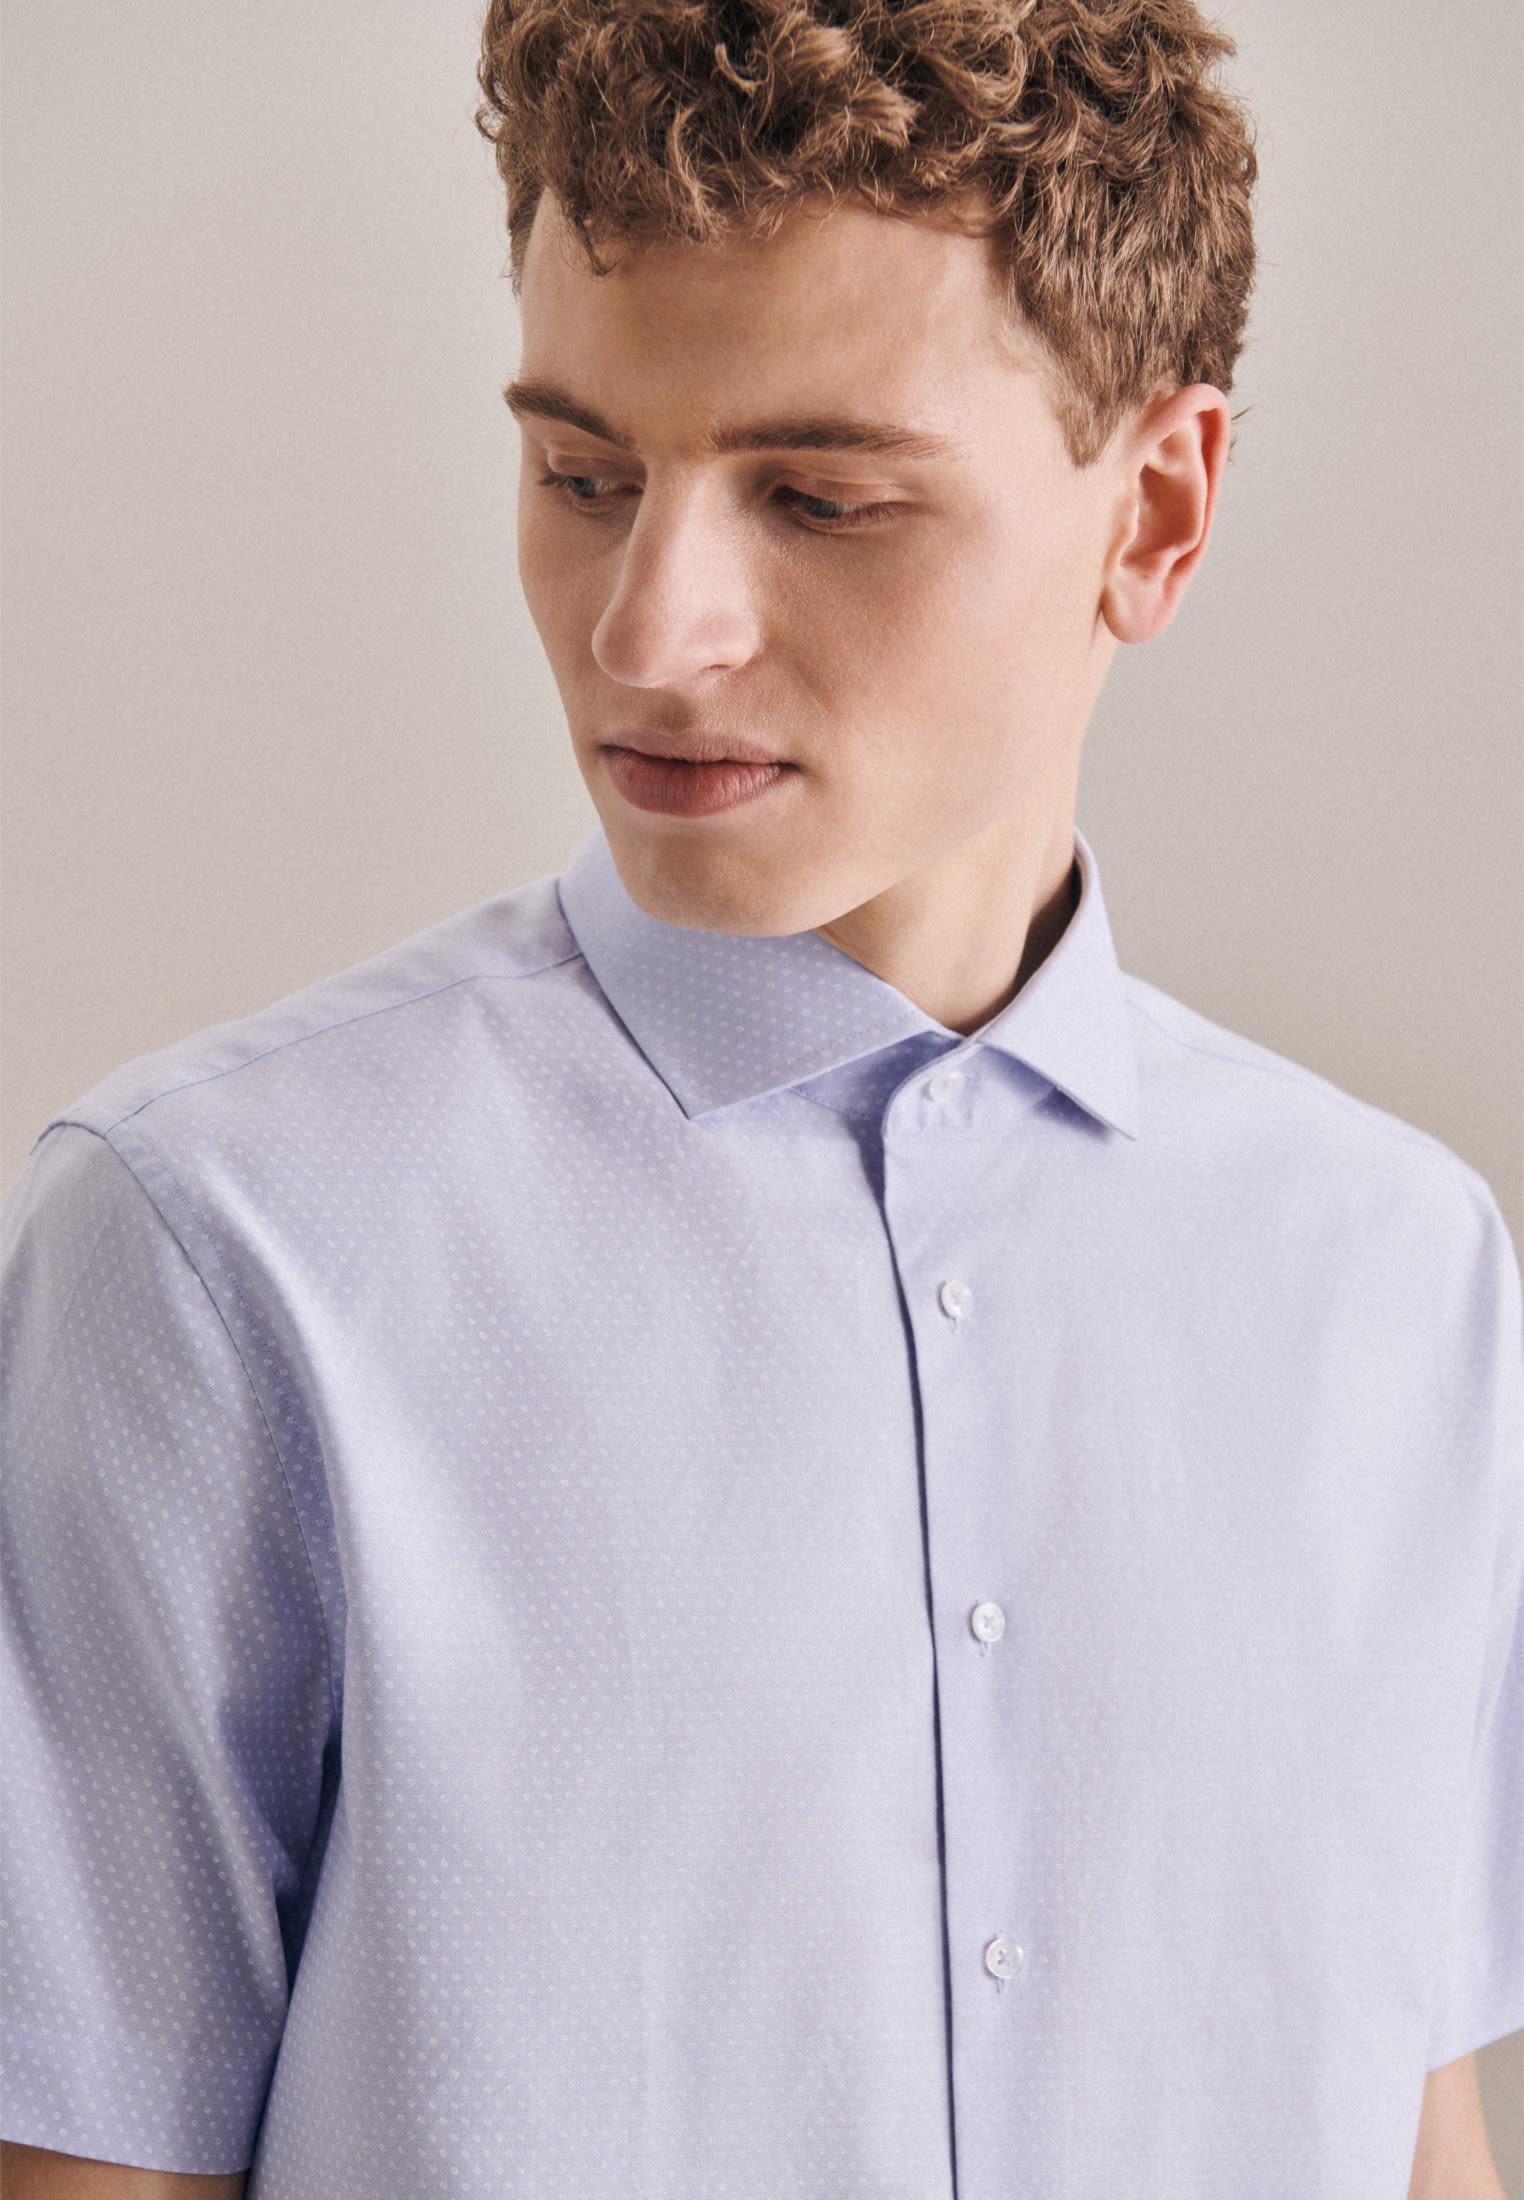 Kurzarm Oxford Business Hemd in Shaped mit Kentkragen in Hellblau |  Jacques Britt Onlineshop